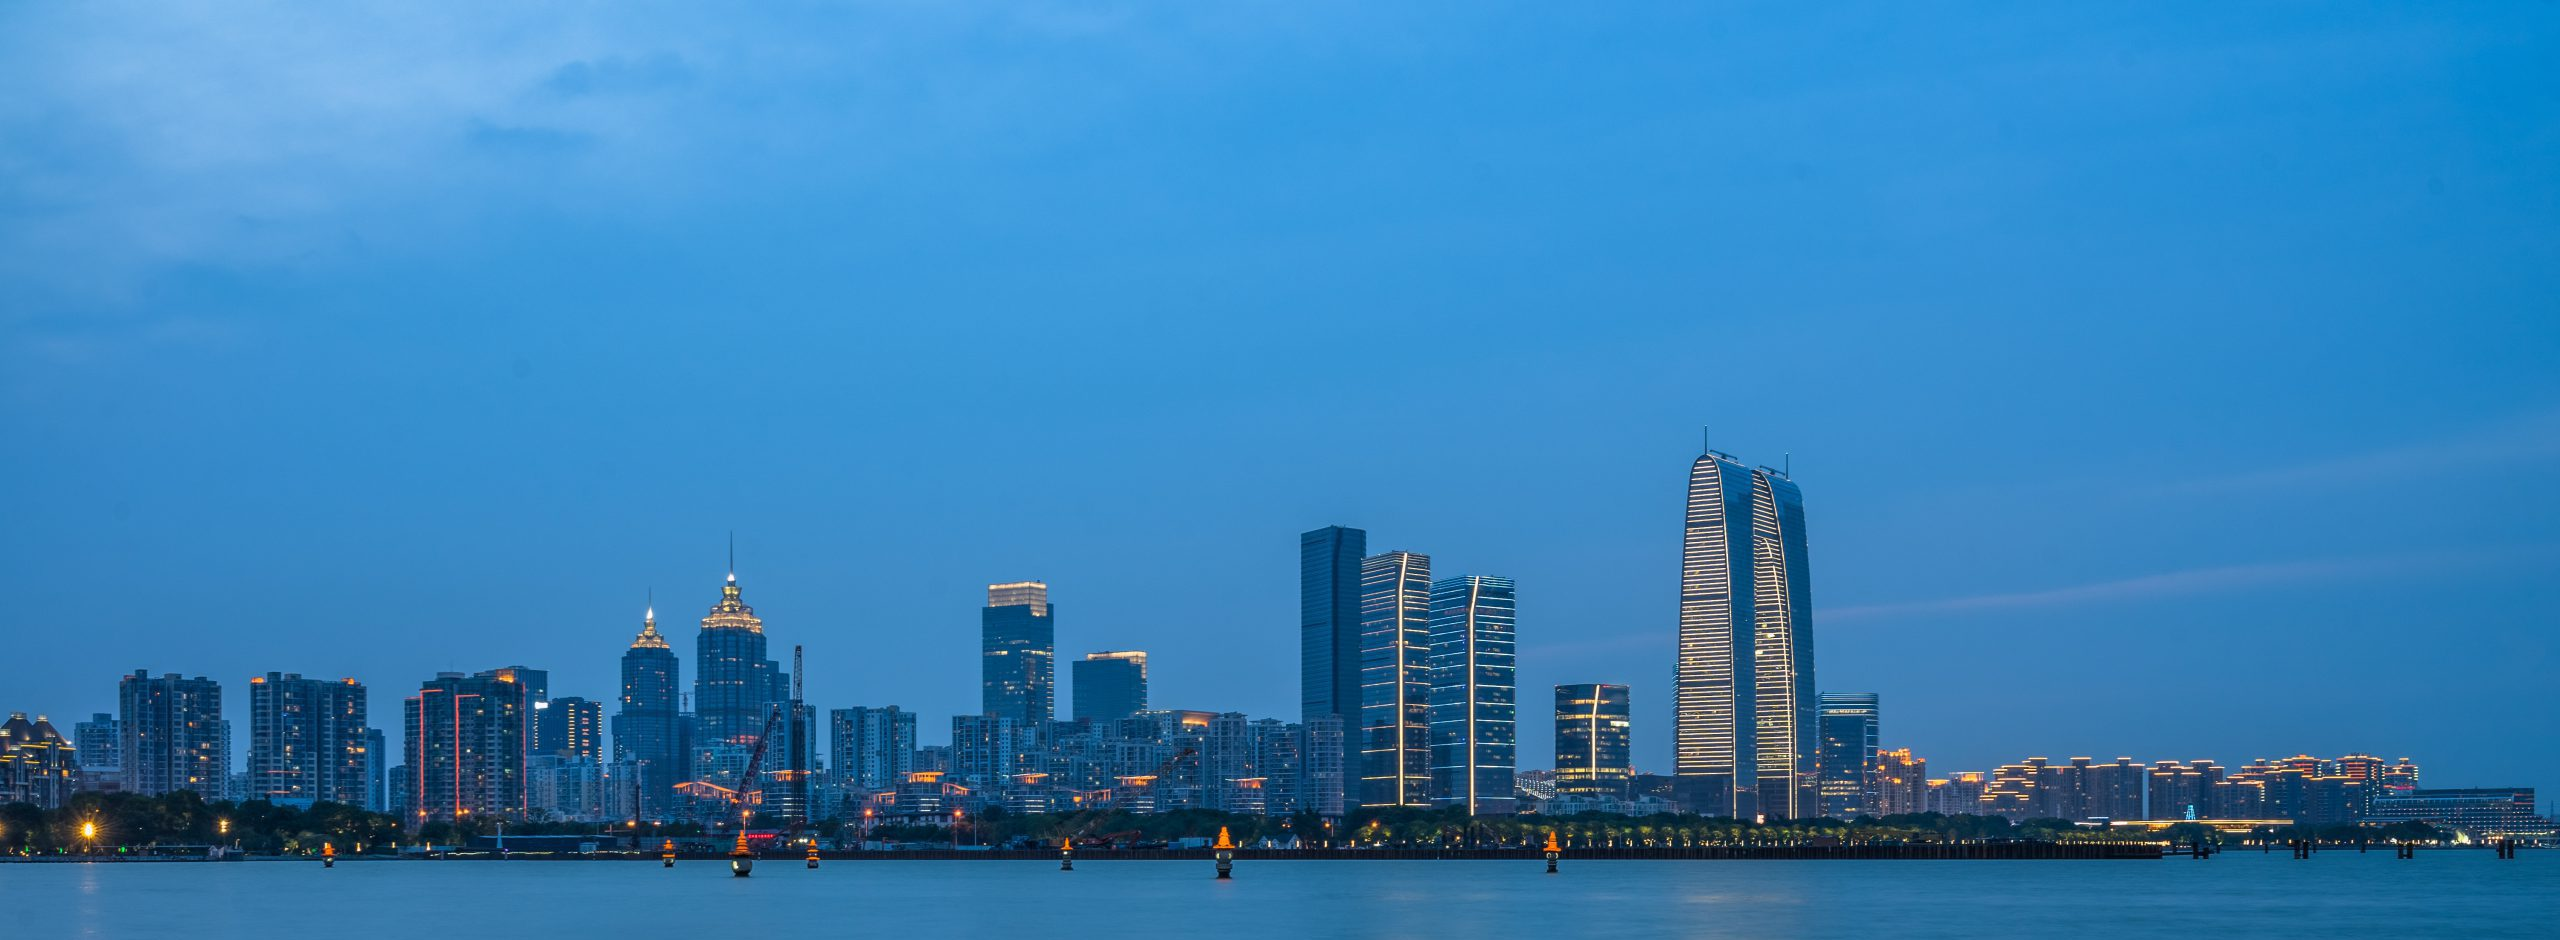 Suzhou-Industrial-Park-Green-Eco -City